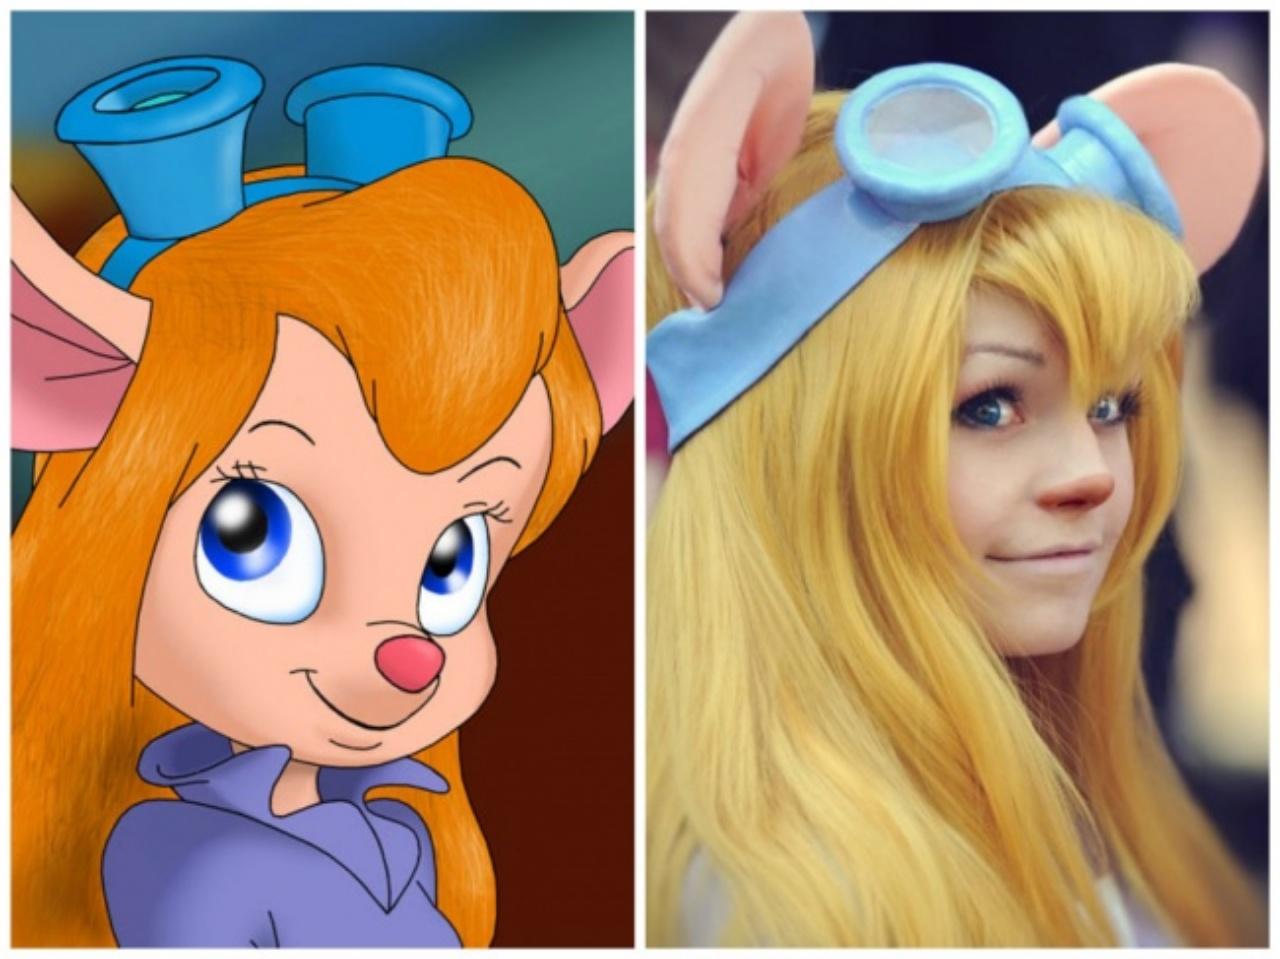 Look-alike of animated characters